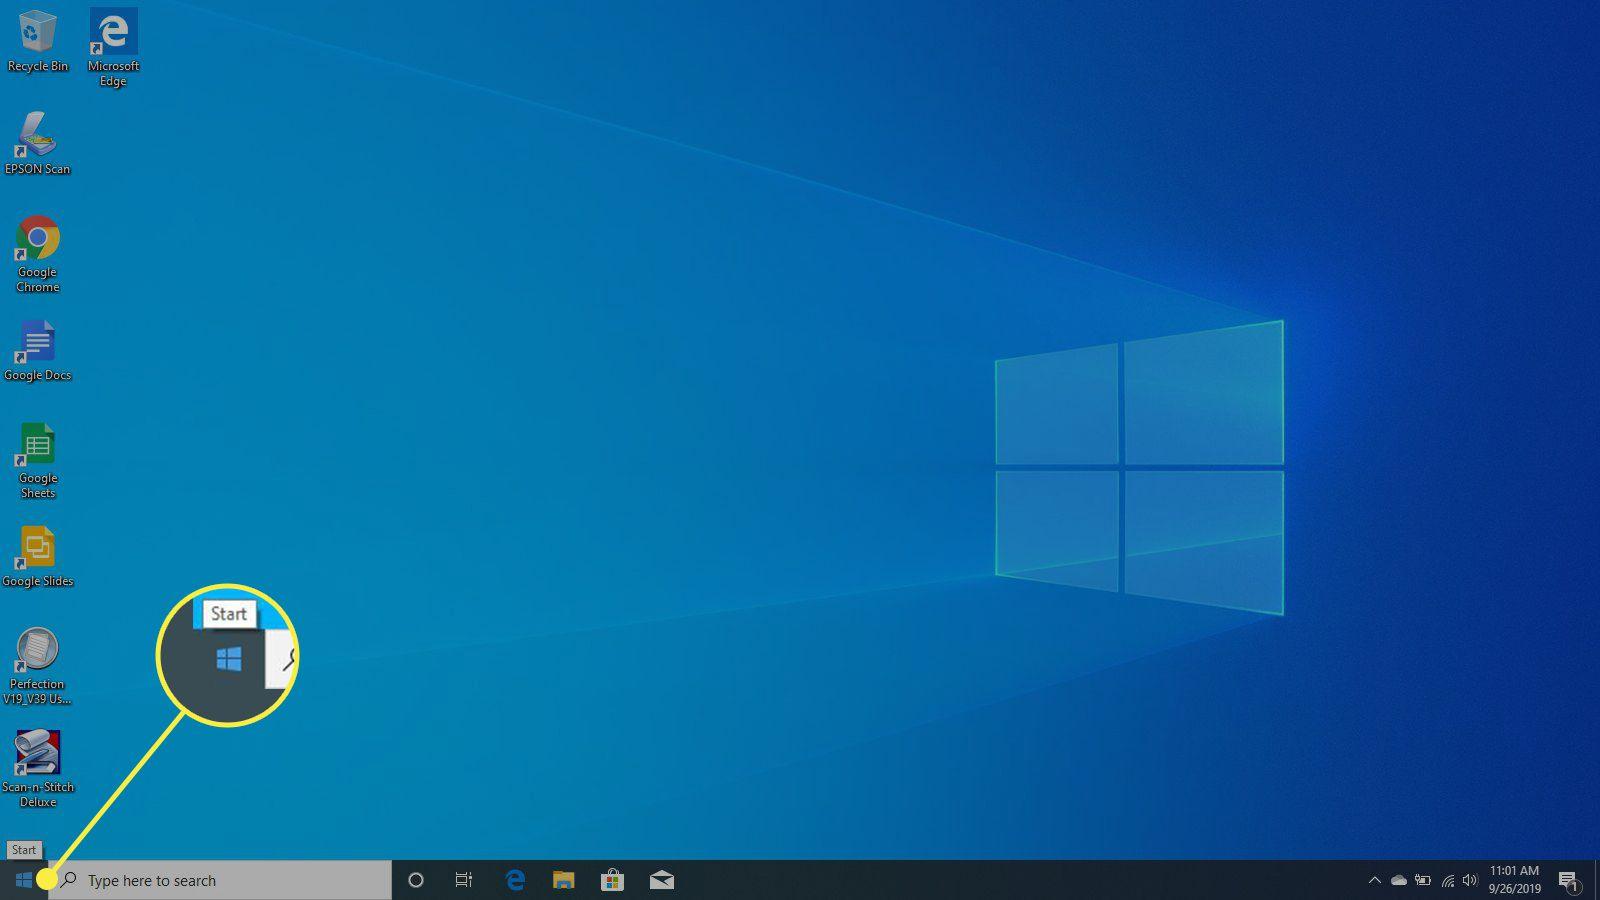 Windows 7 apps on startup